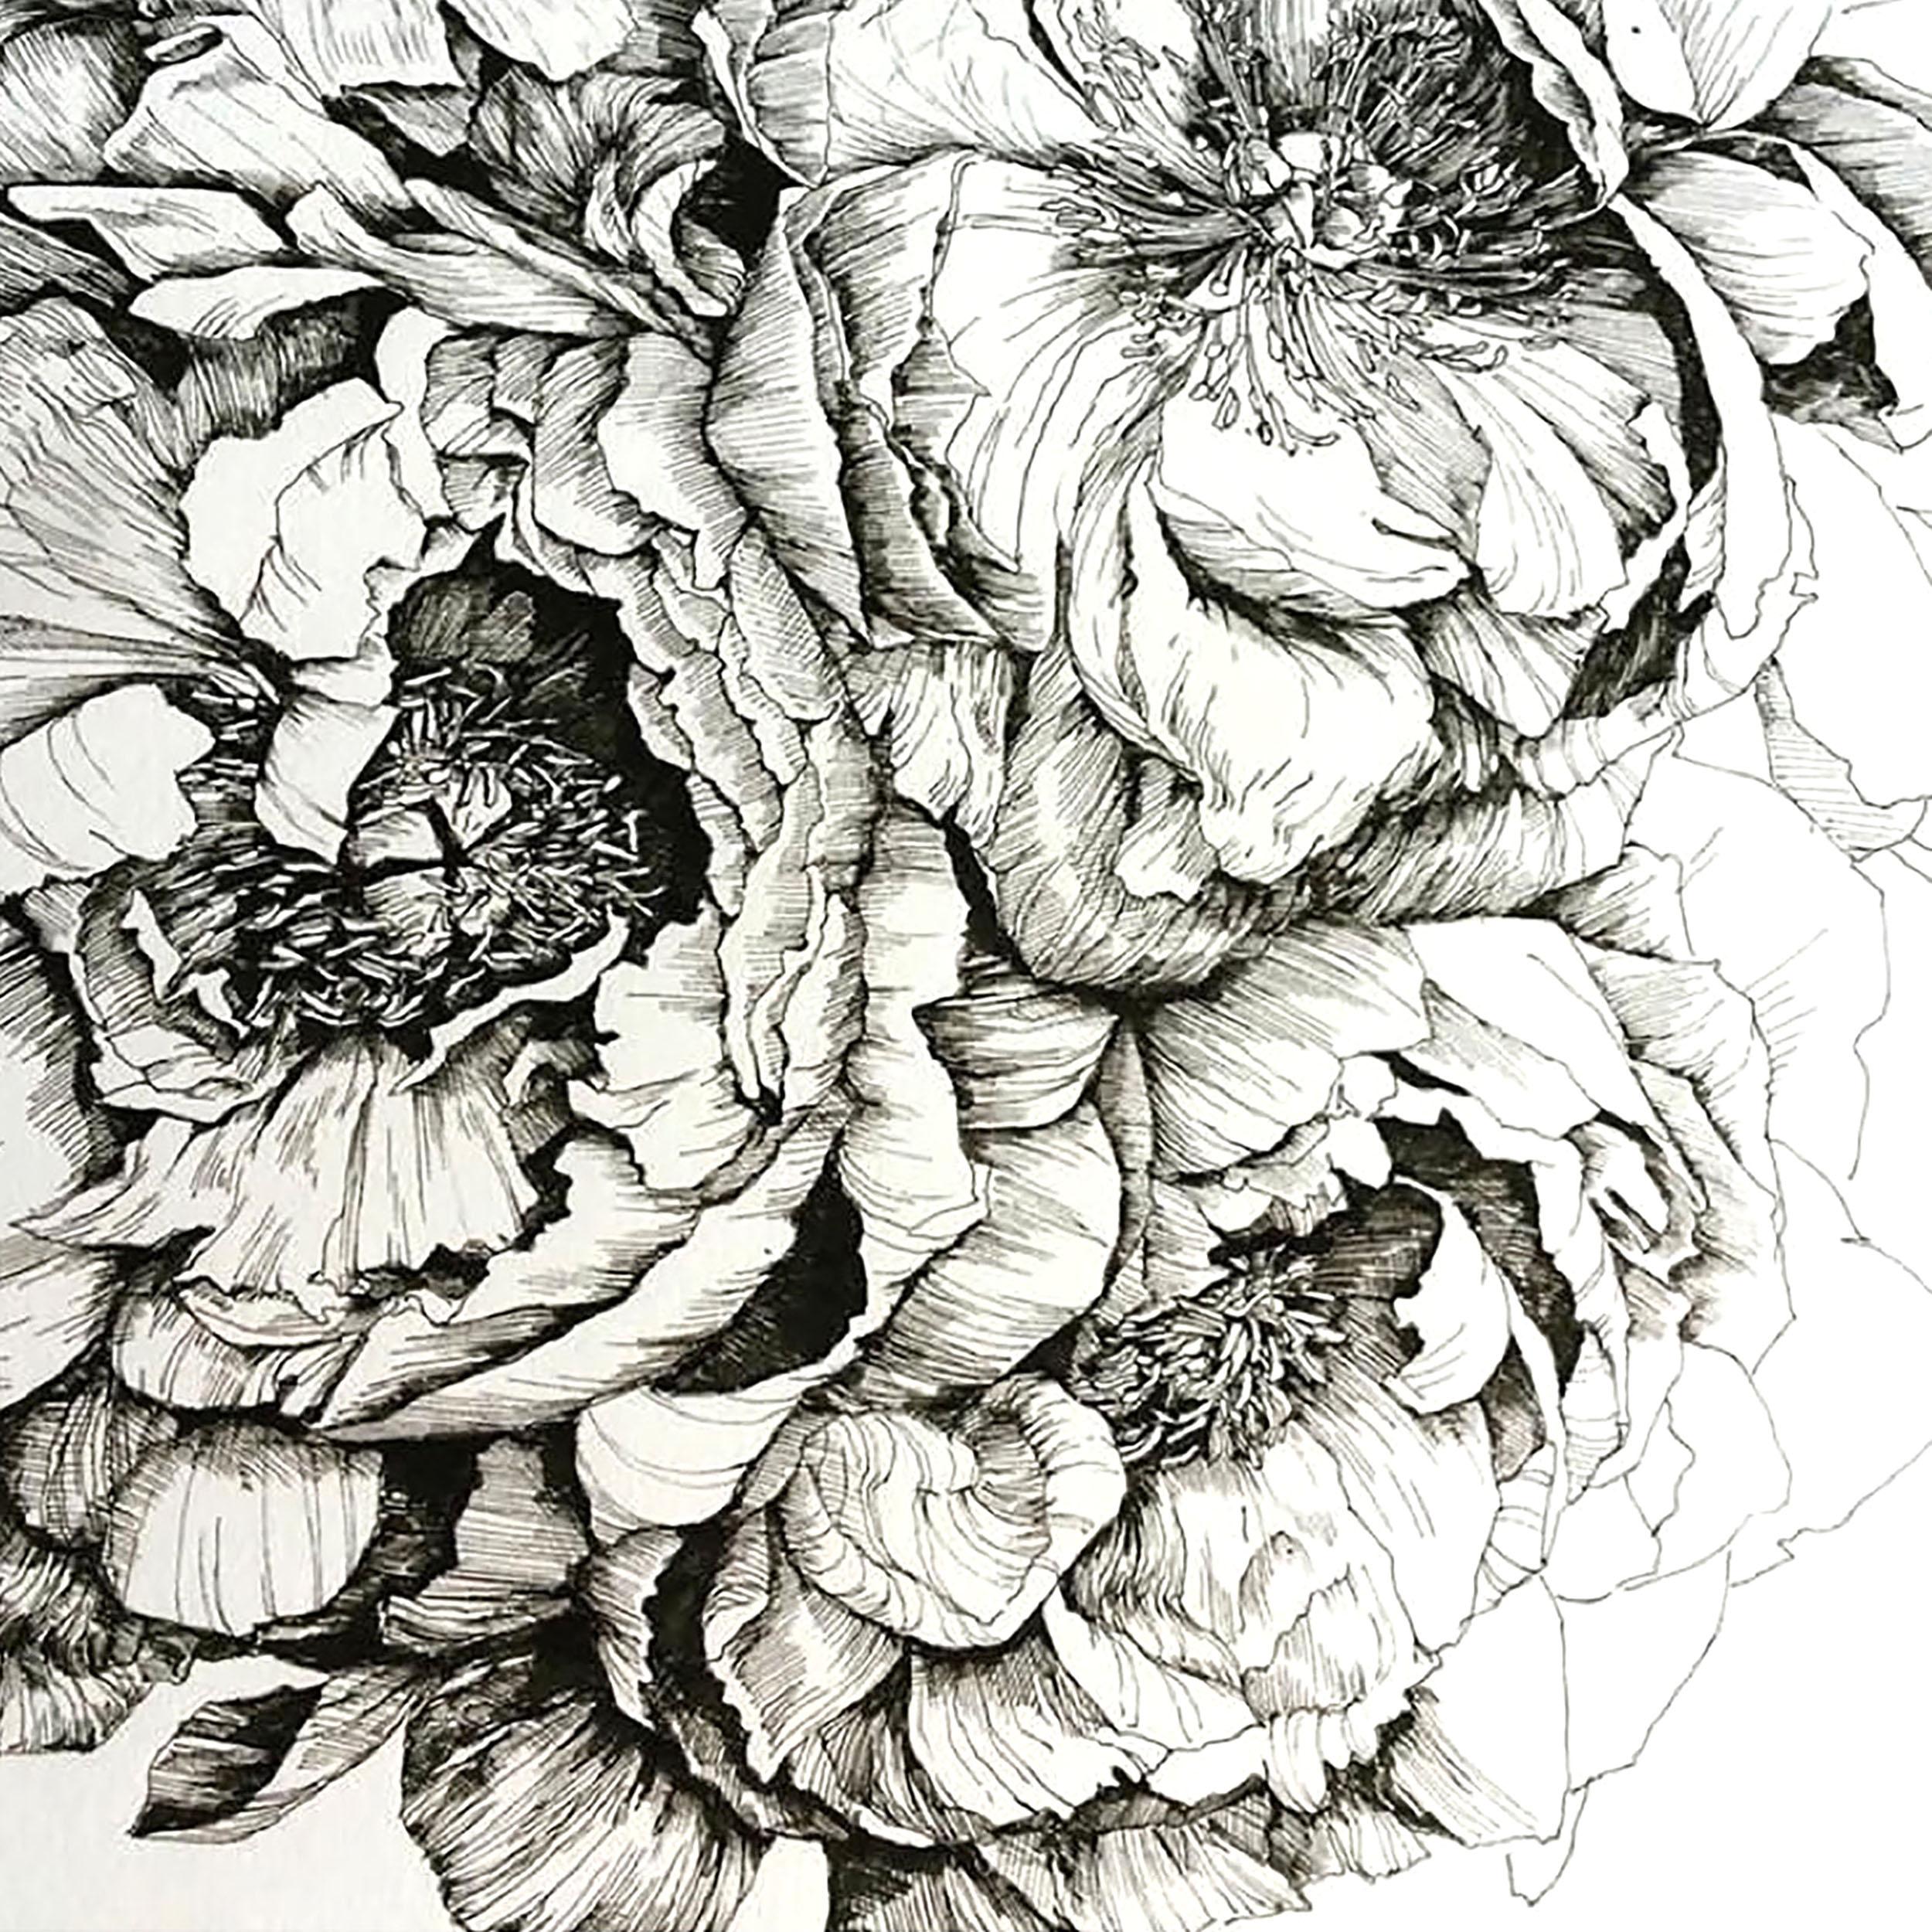 Art by Lizzie Coles